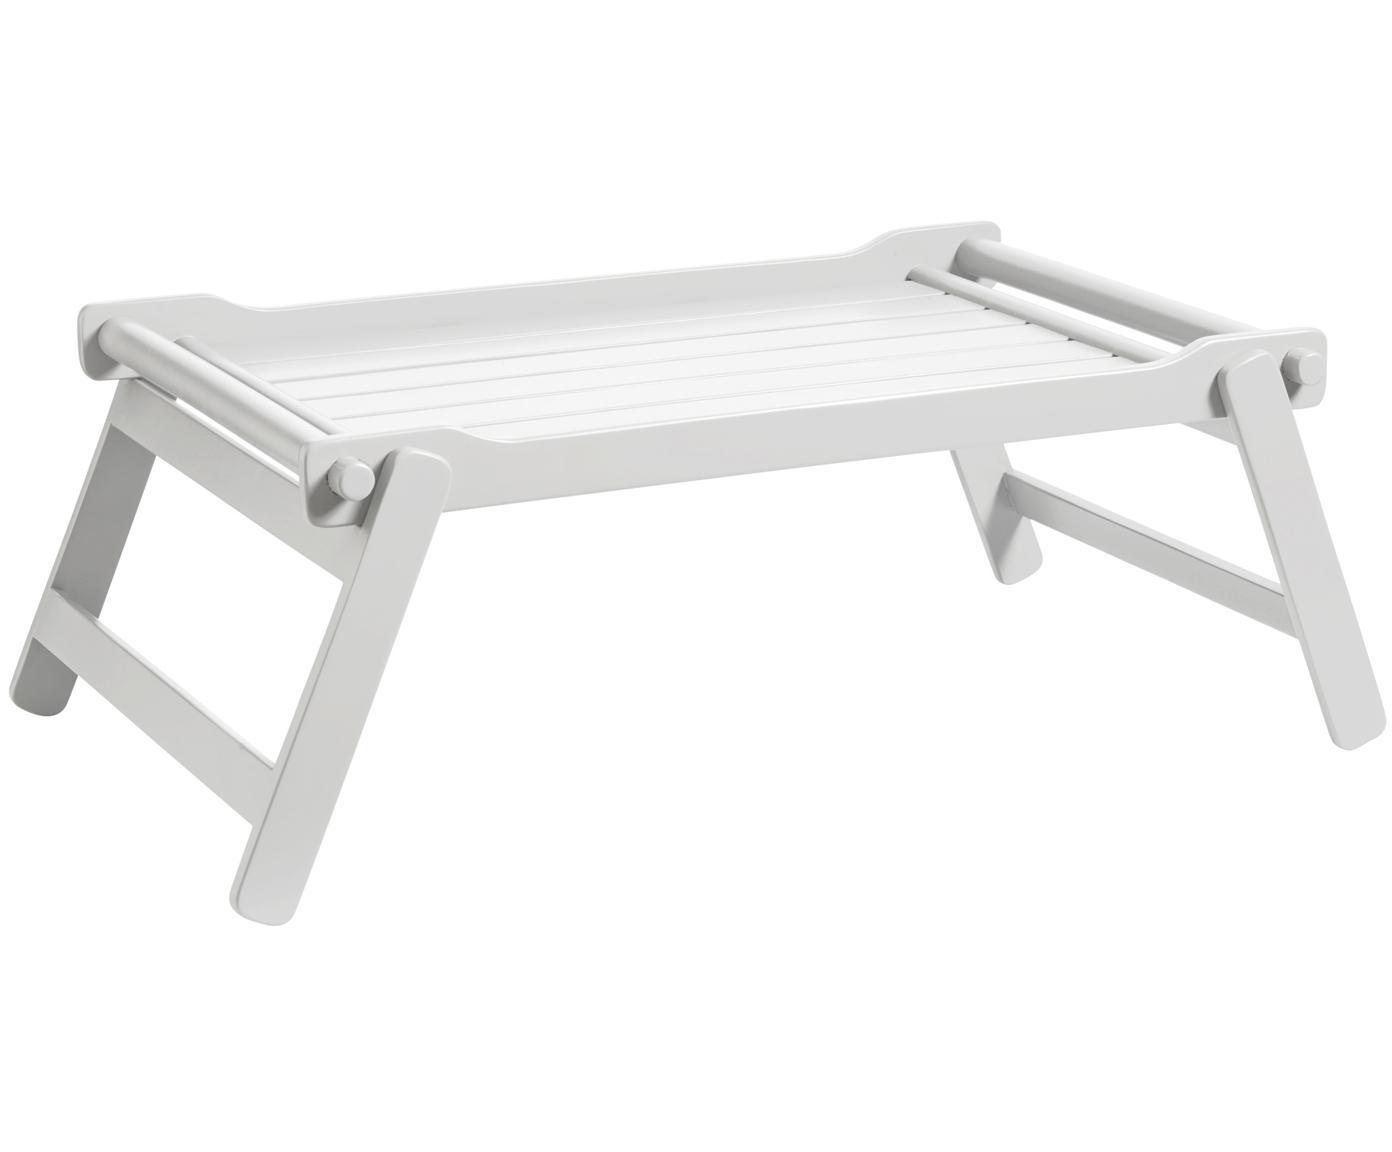 Houten dienblad Bed in wit, Polyurethaan gelakt mahoniehout, Wit, B 58 x D 36 cm